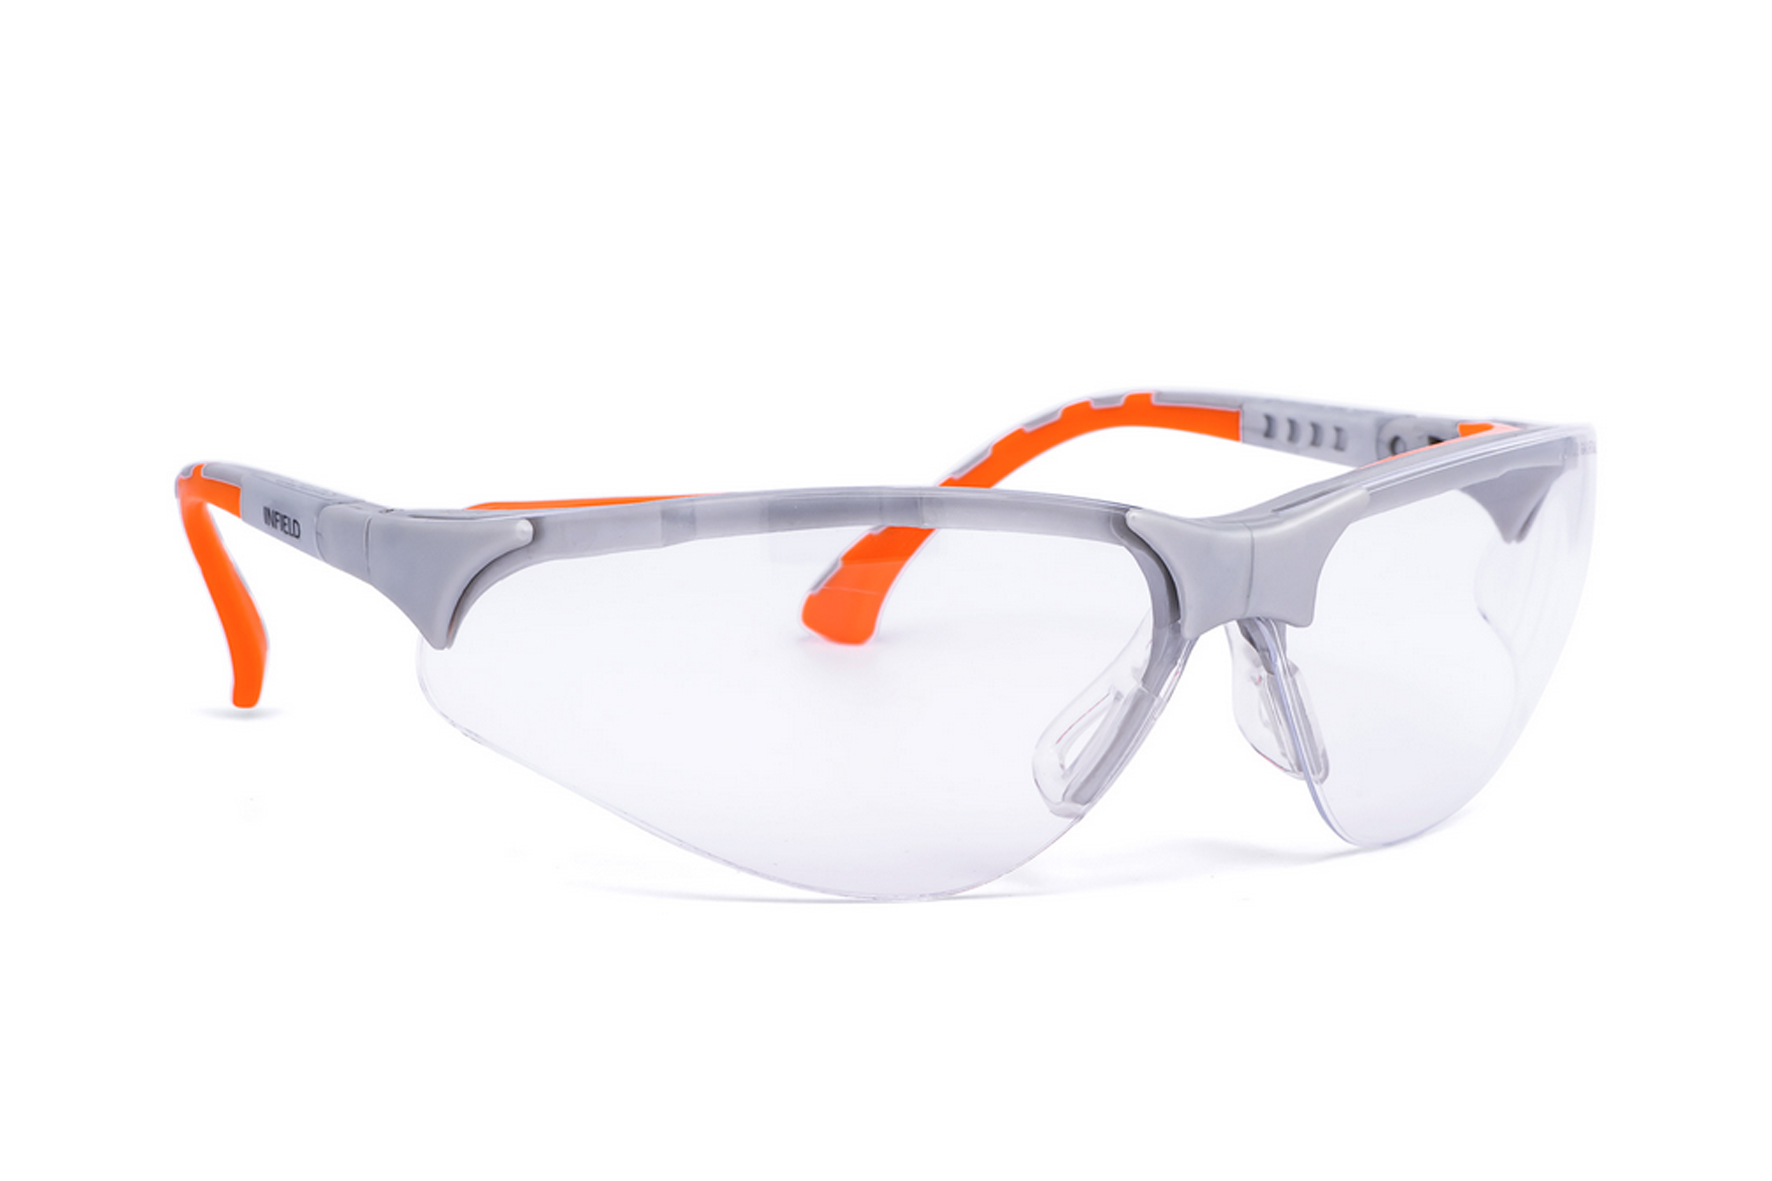 lunettes de securite terminator achat en ligne ou dans notre magasin. Black Bedroom Furniture Sets. Home Design Ideas